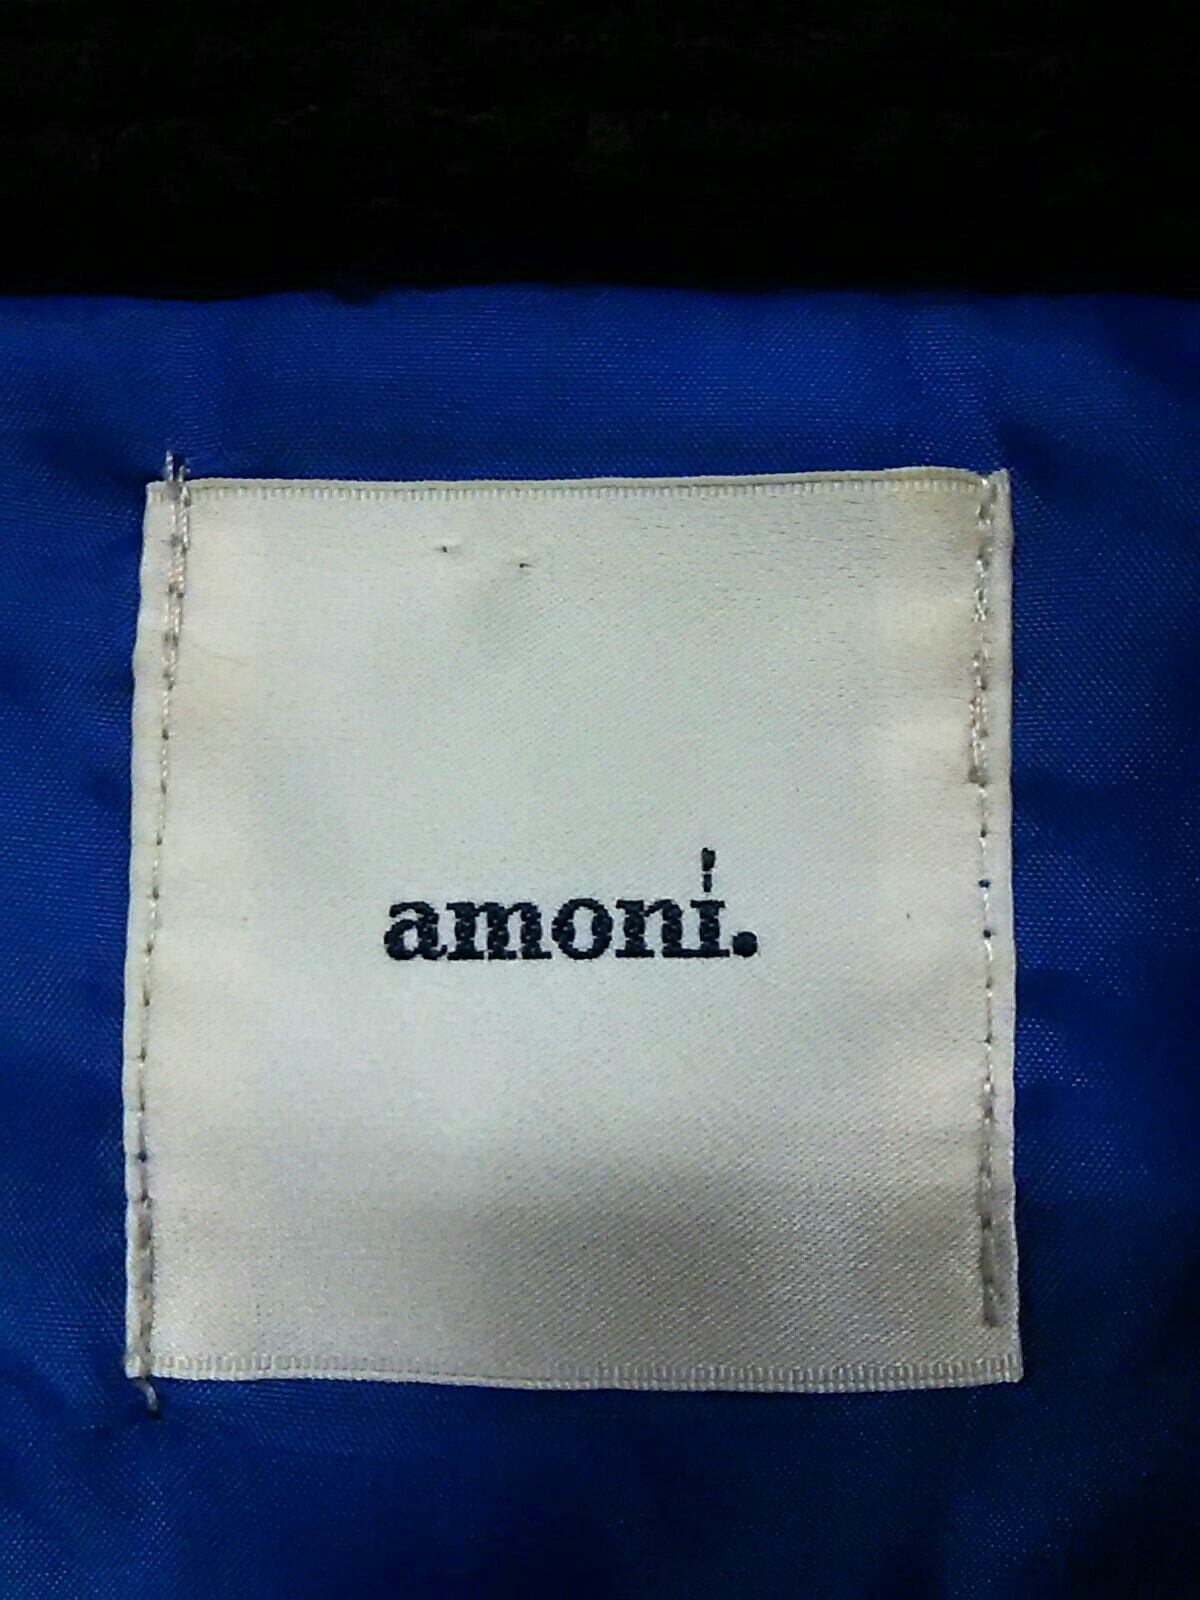 amoni.(アモン)のダウンベスト